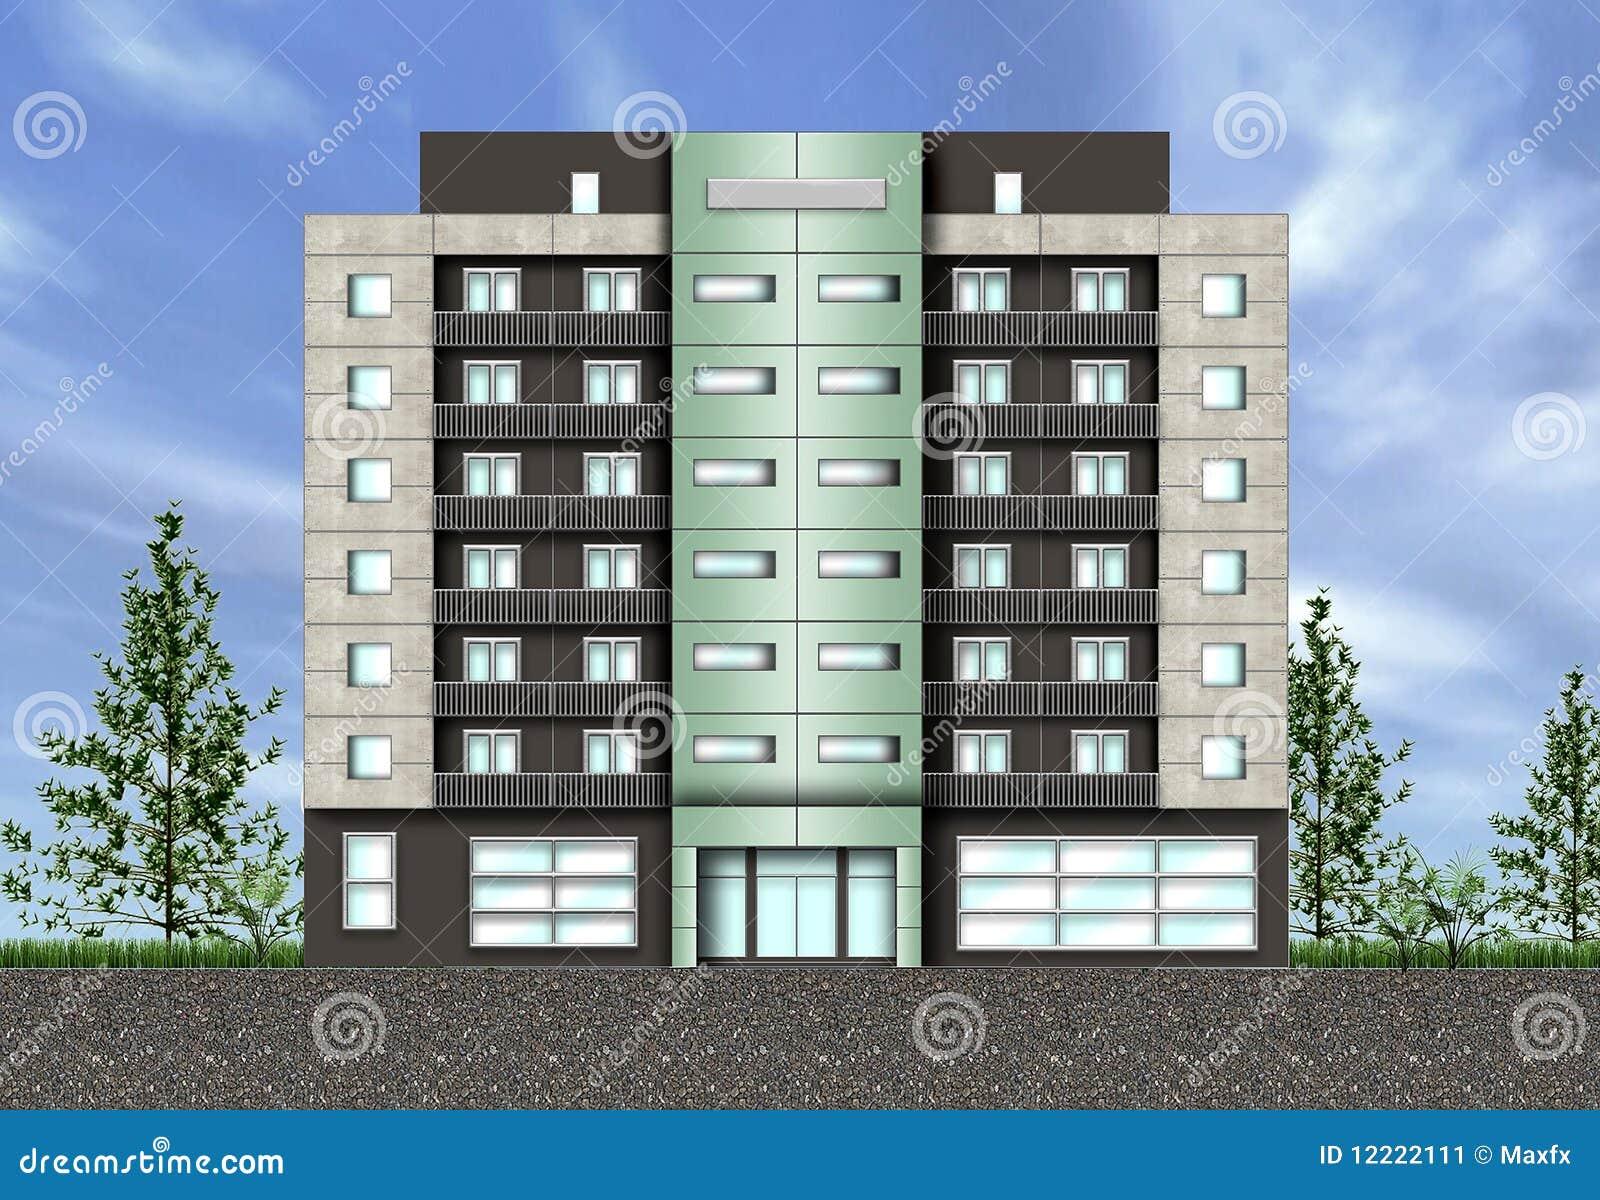 Building Exterior: Building Exterior Stock Image